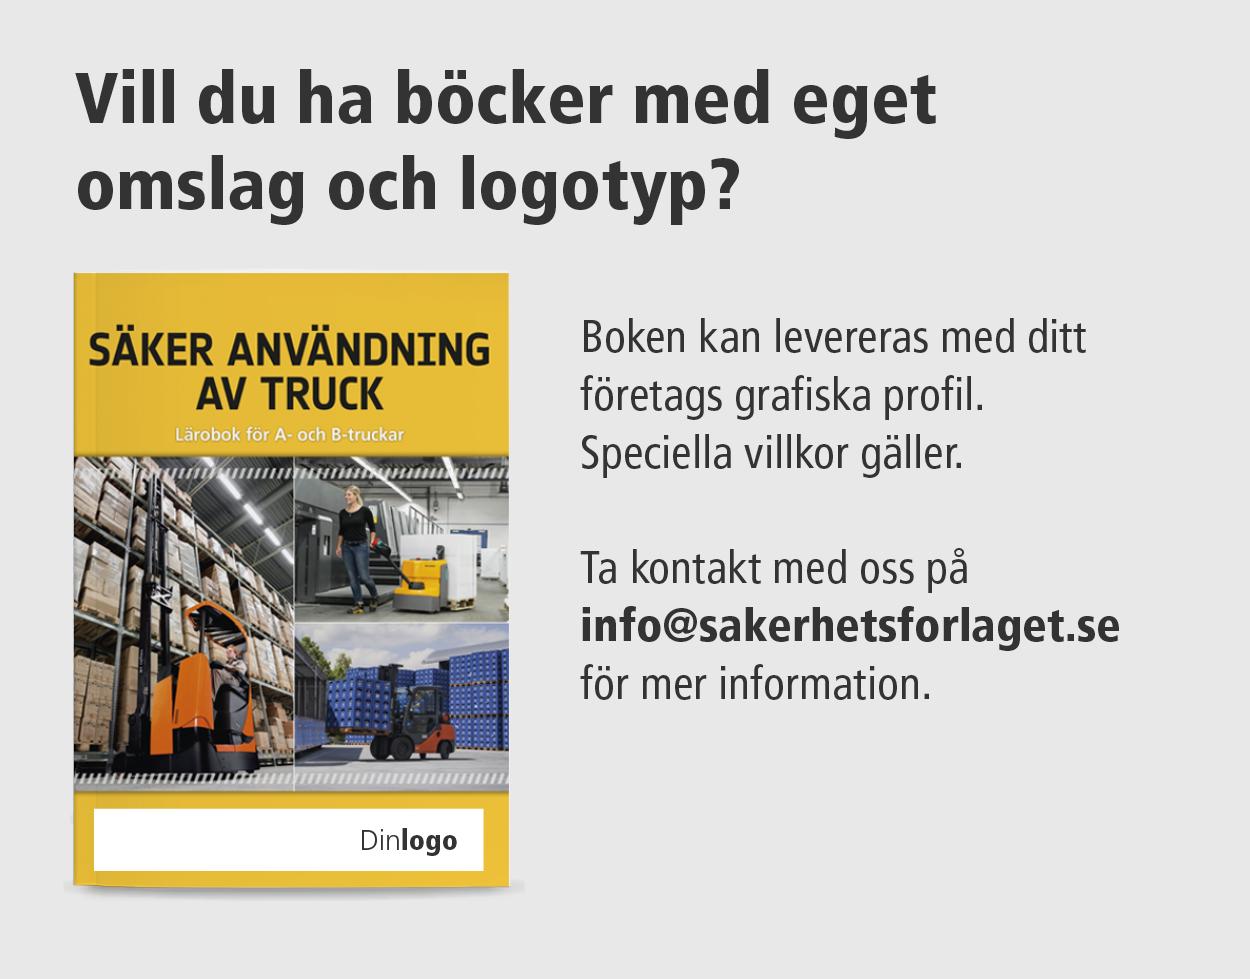 Truckbok med eget omslag og logotyp